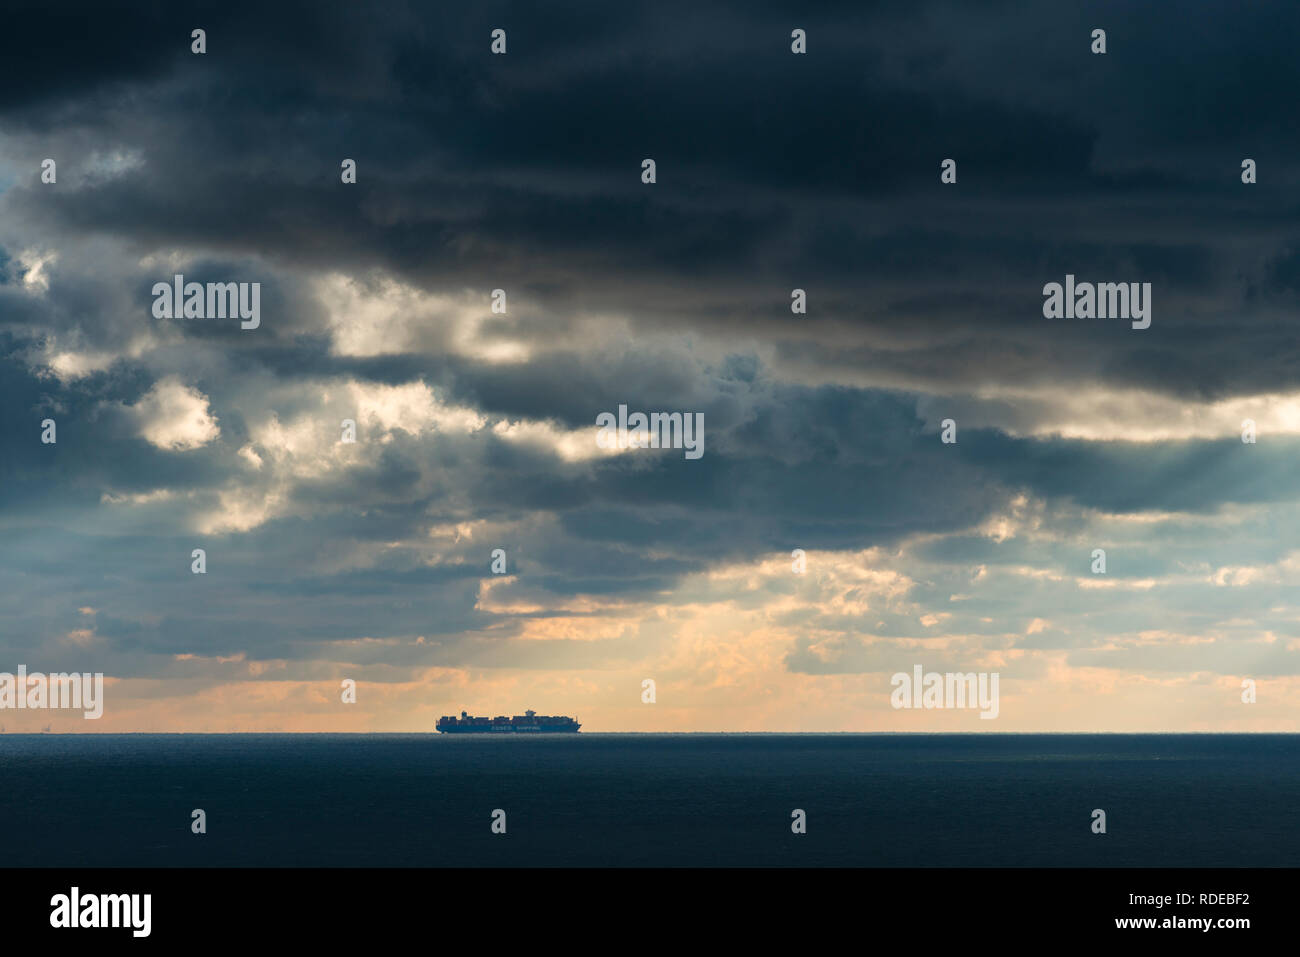 Deutschland, Pinneberg, Insel, Nordsee, Helgoland - Stock Image